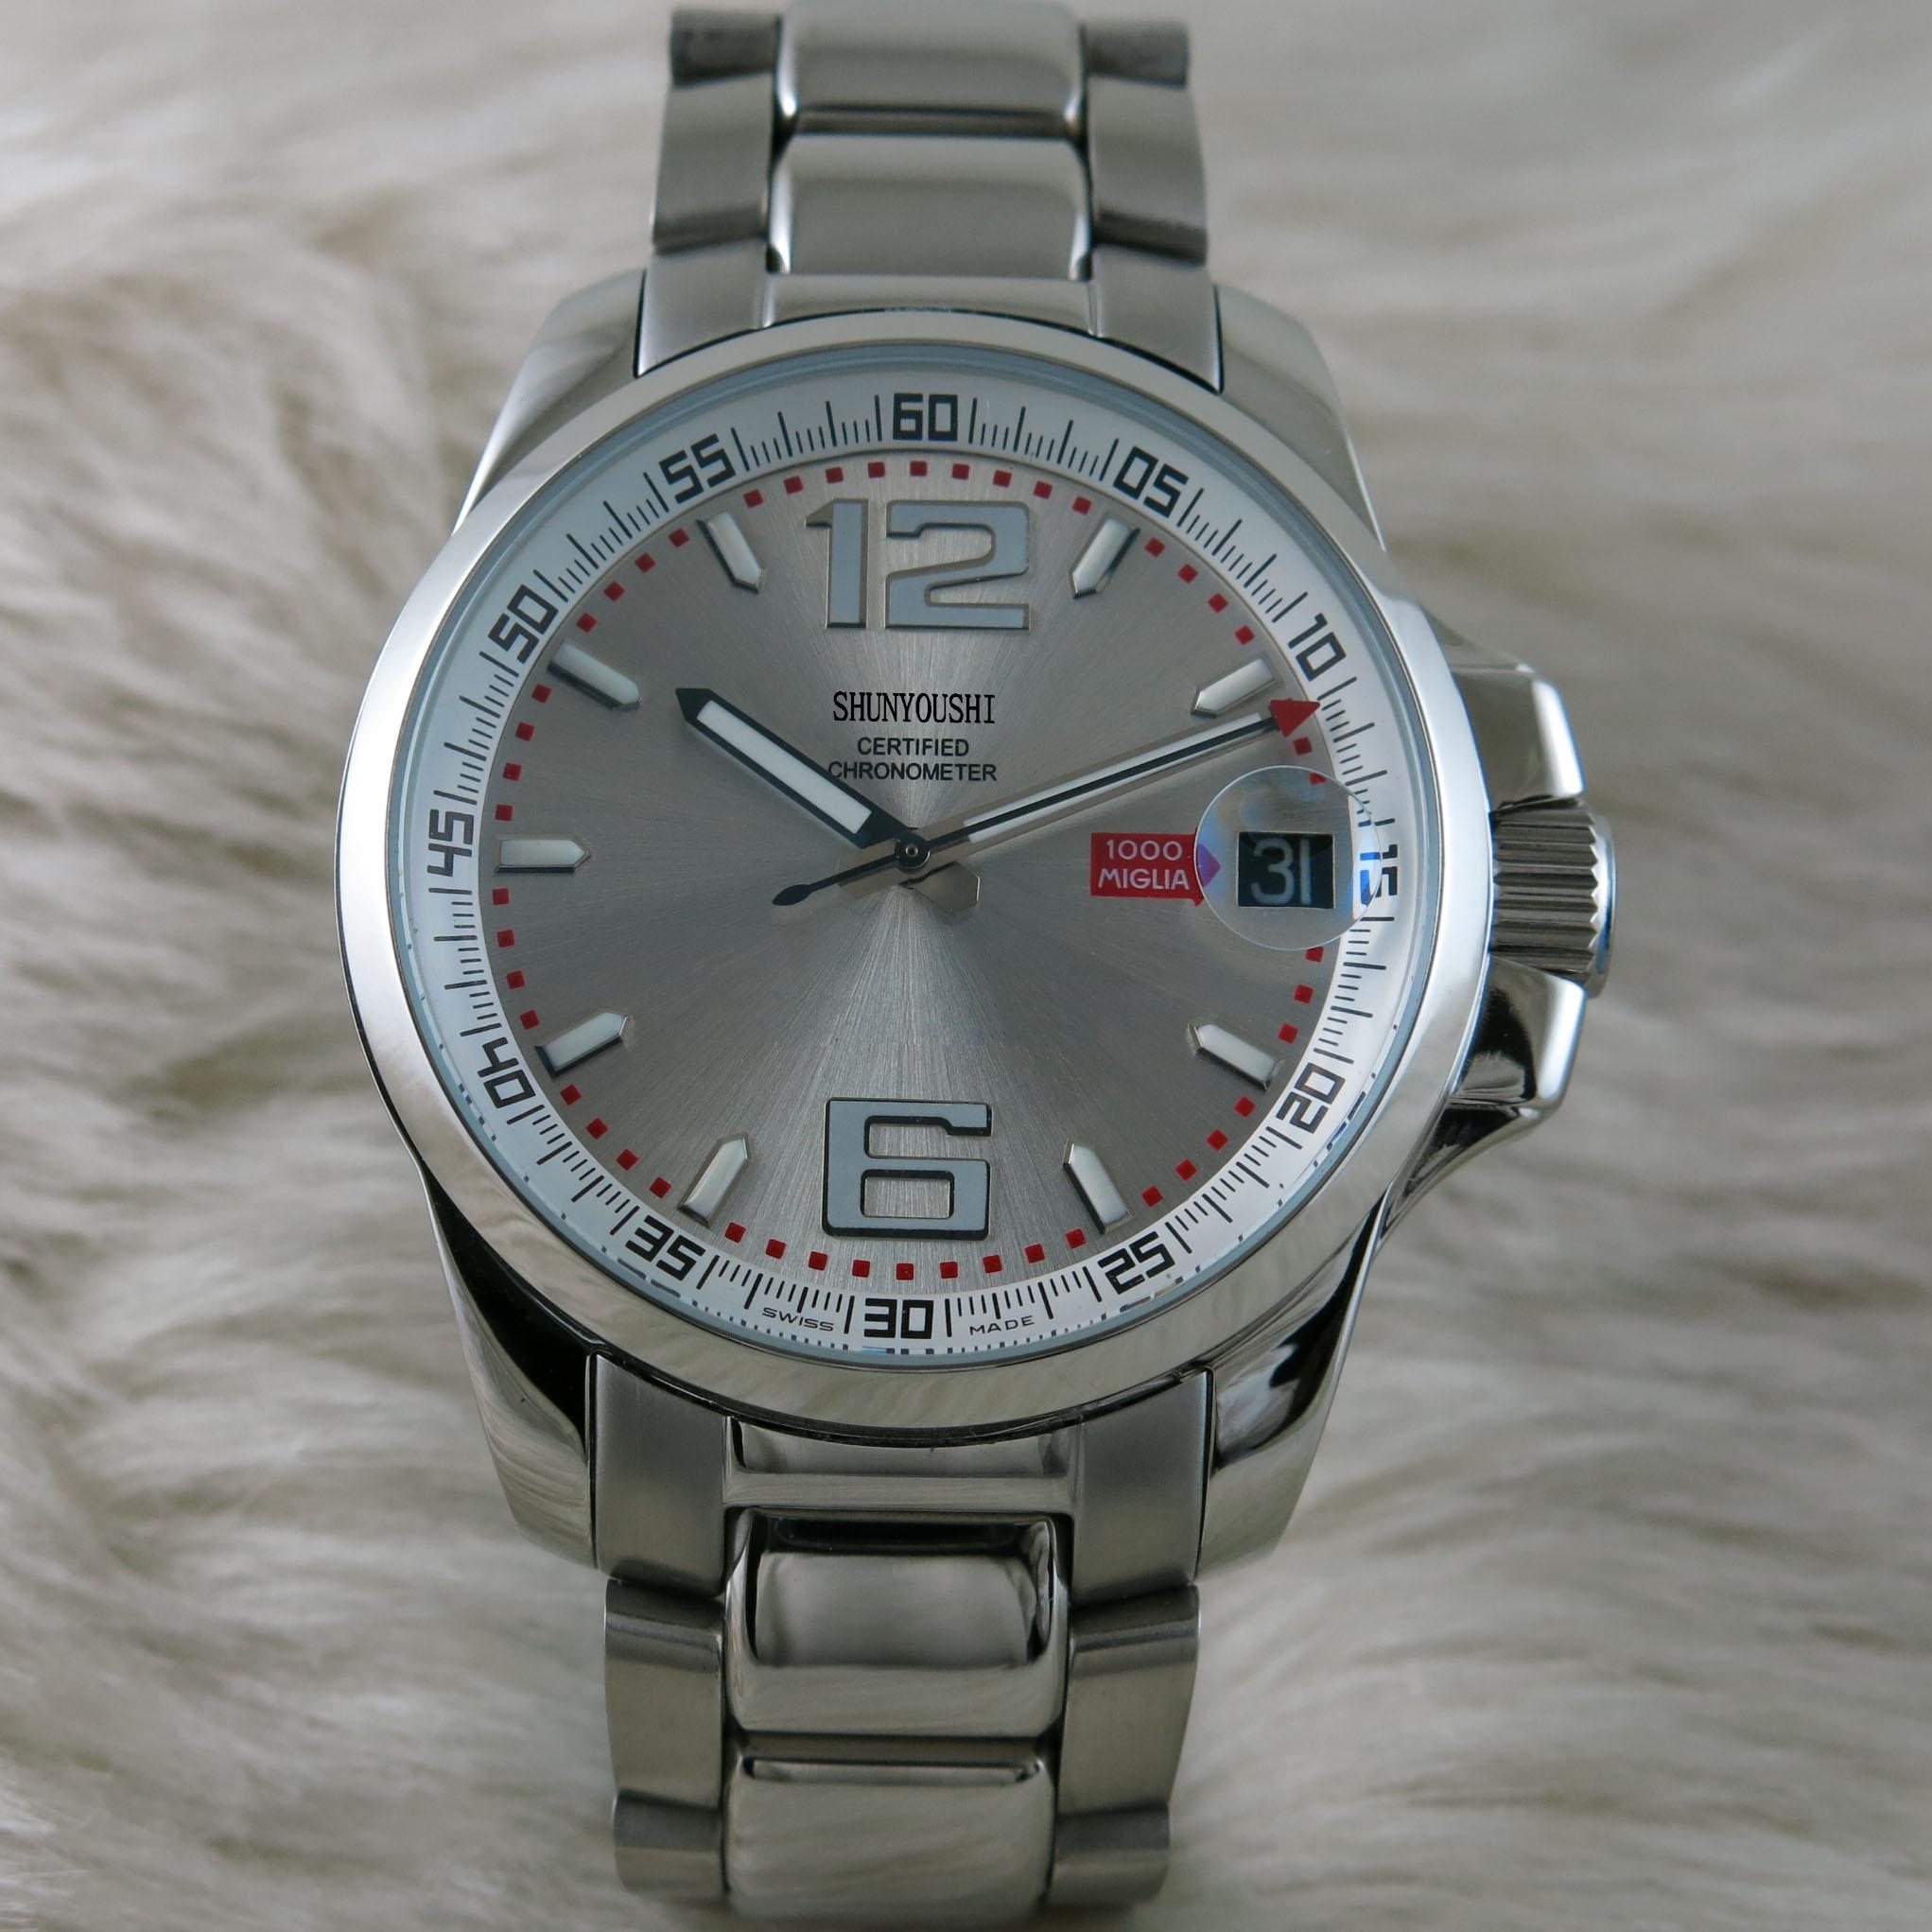 WG06445   Mens Watches Top Brand Runway Luxury European Design Automatic Mechanical Watch | Fotoflaco.net